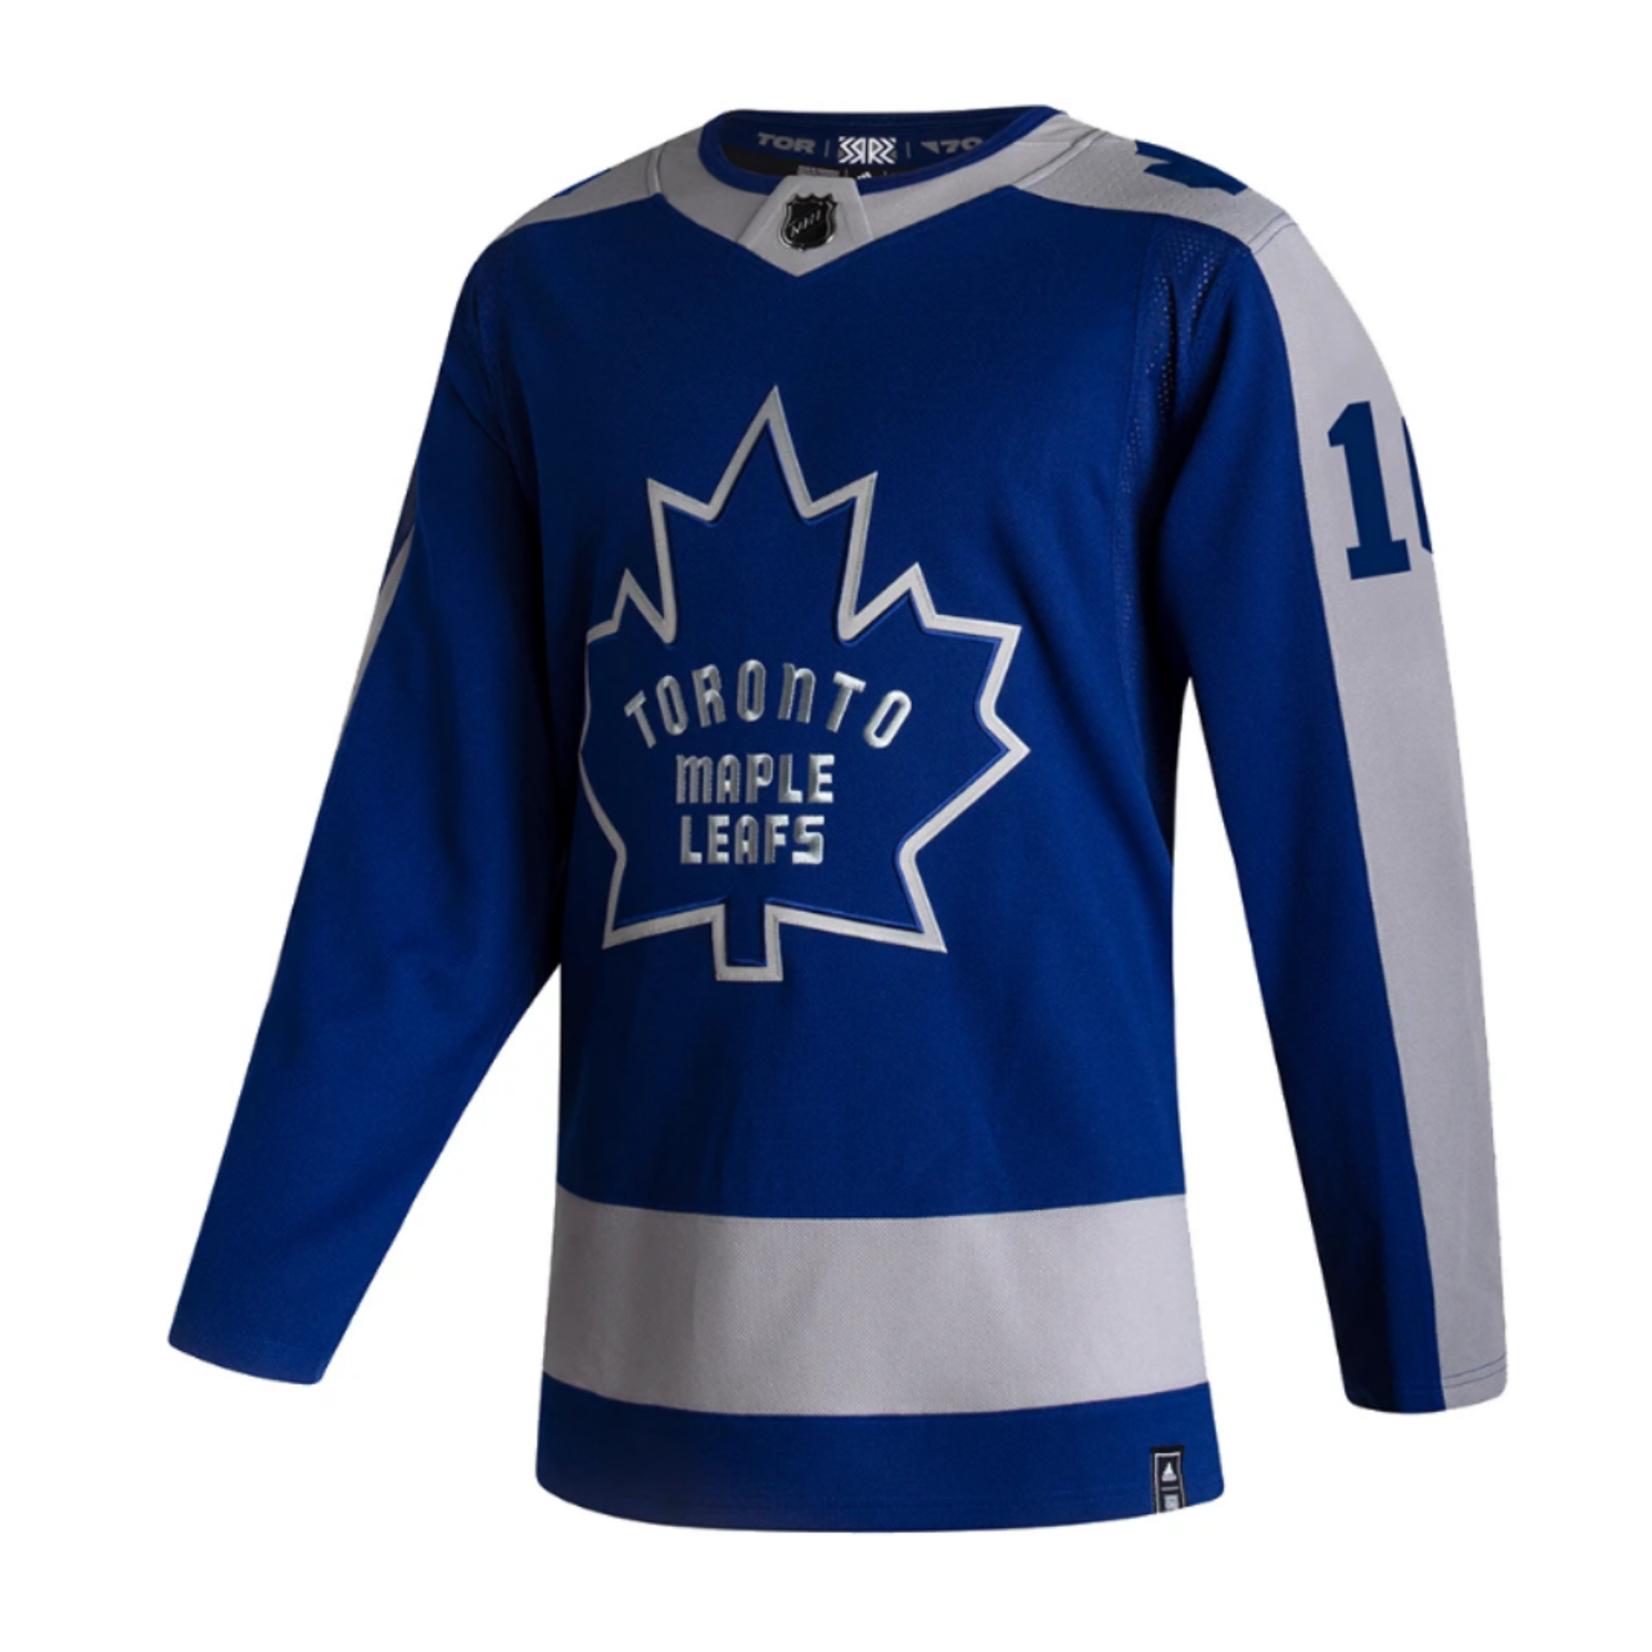 Adidas NHL Retro Reverse- Mitch Marner Jersey